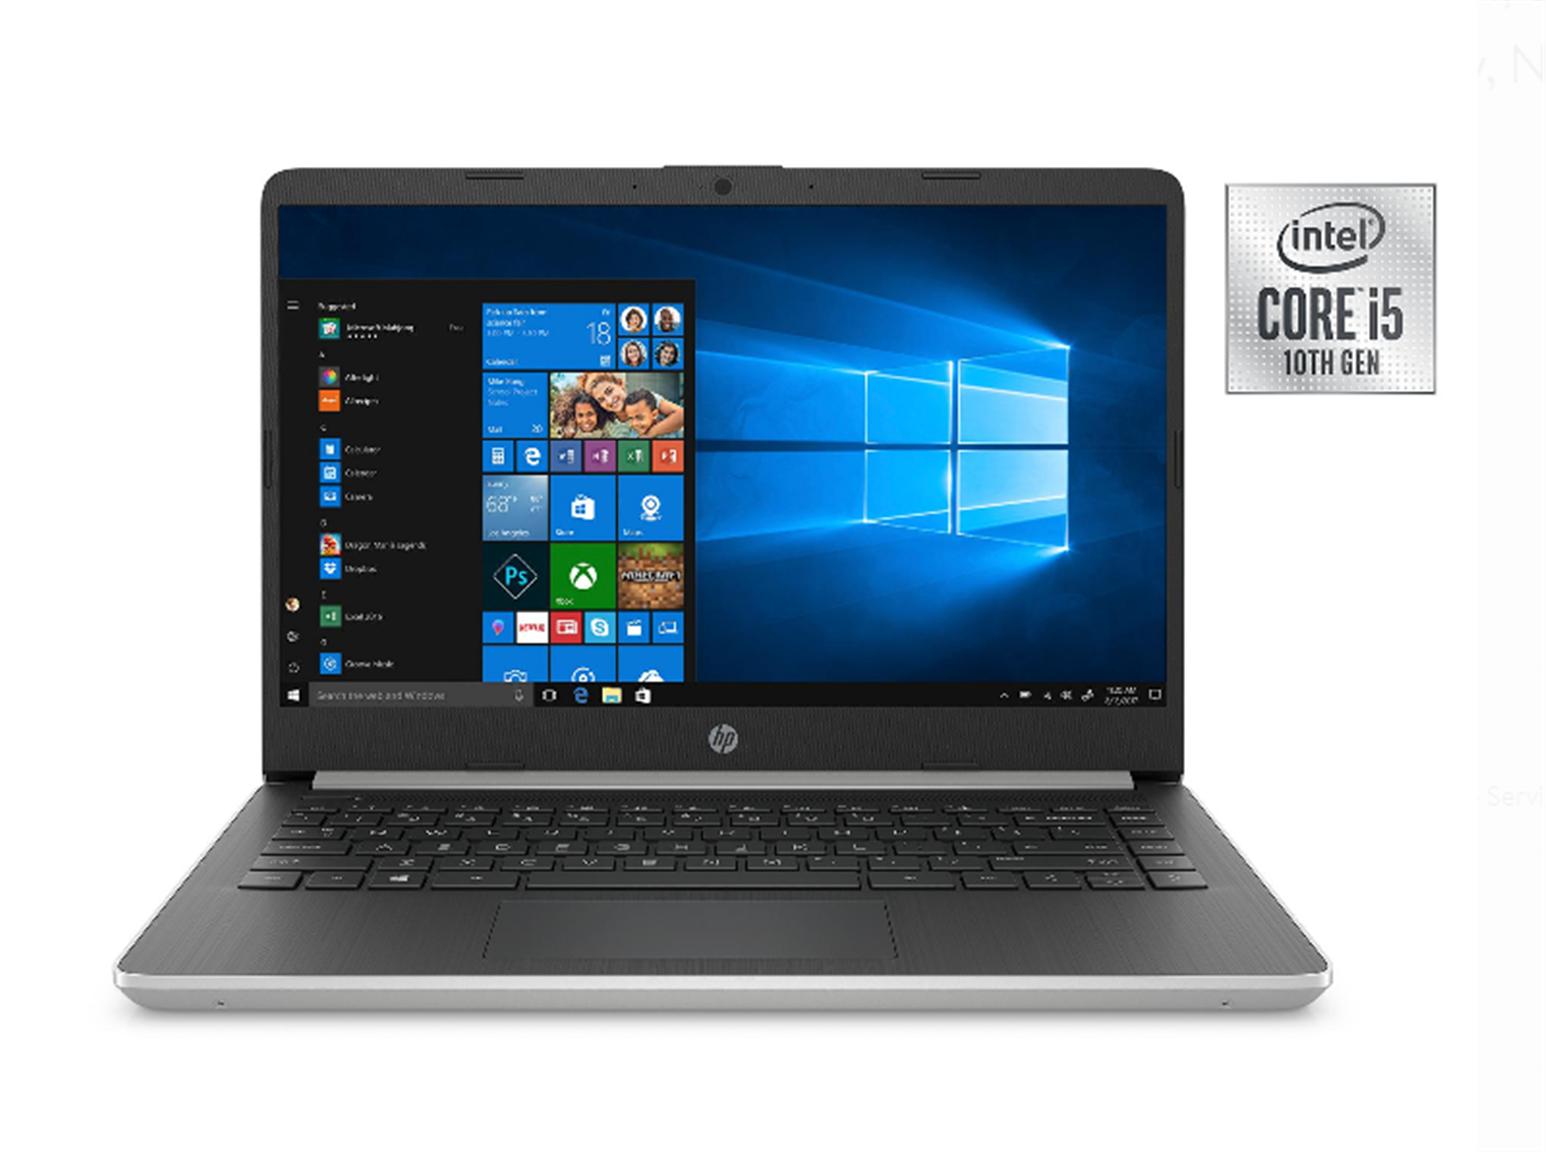 HP 14″ Laptop, Intel Core i5, 8GB SDRAM, 256GB SSD + 16GB Intel Optane Memory Only $359.00, Reg $599.00 + FS!